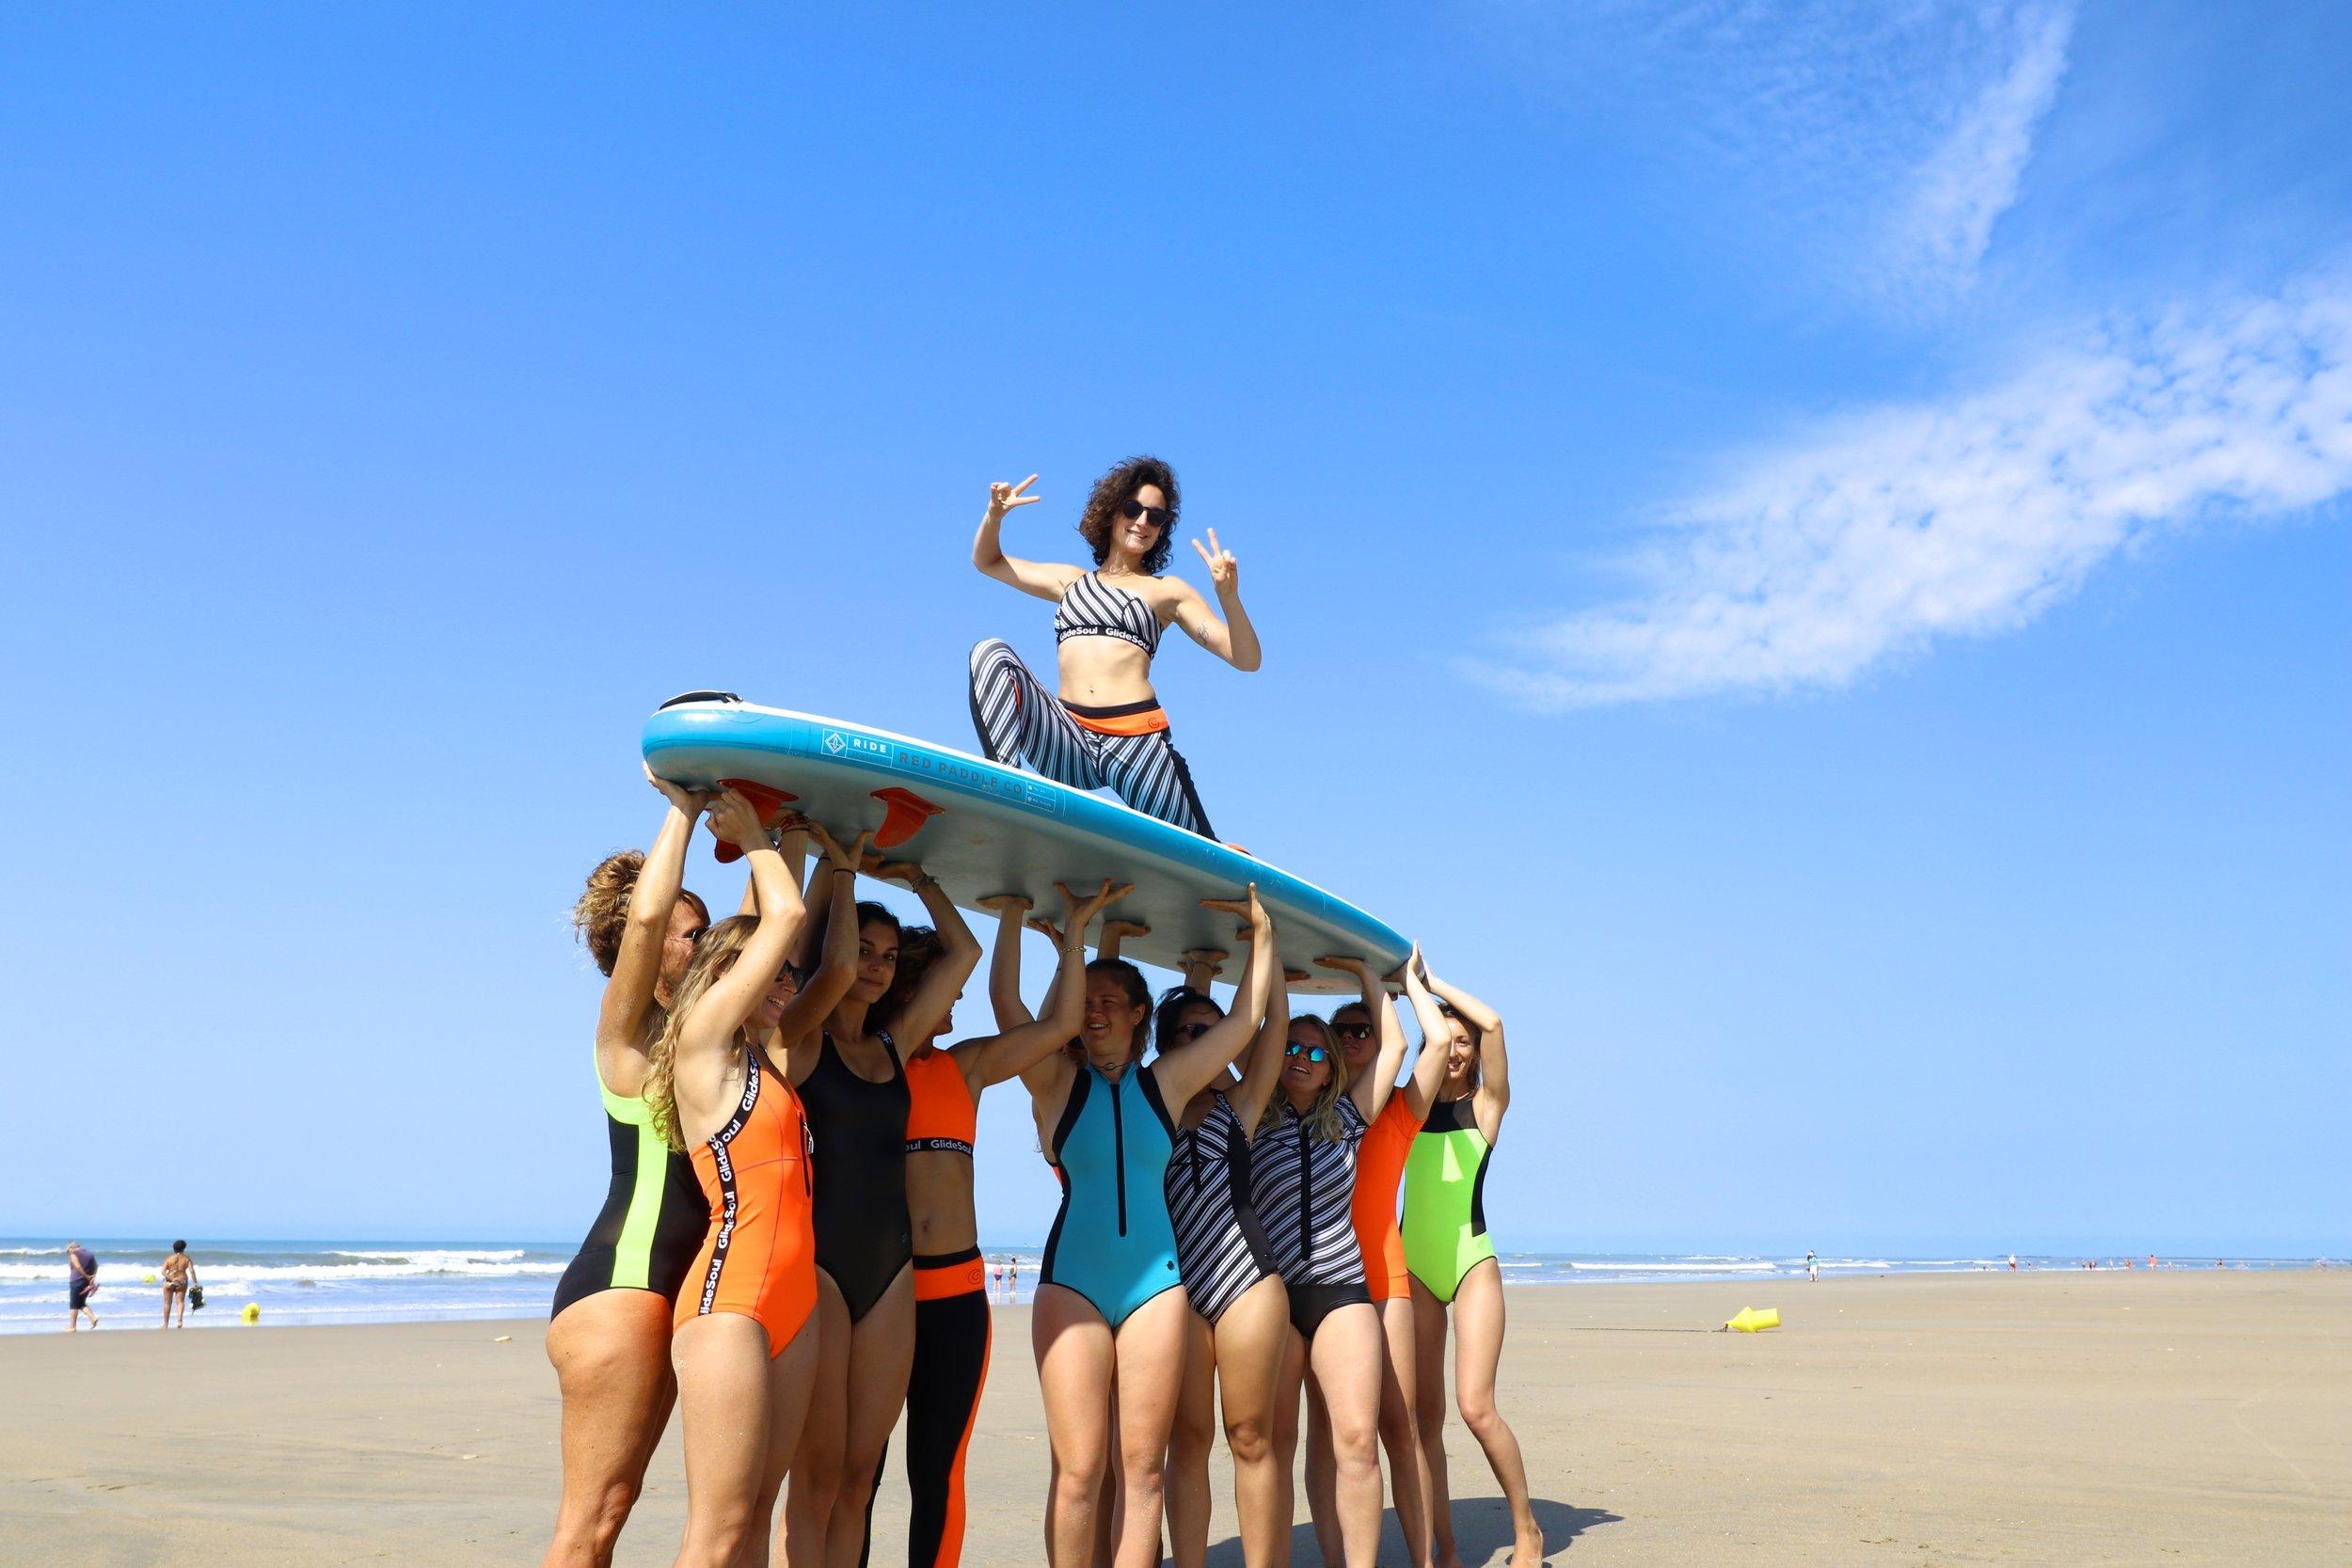 Yoga teacher - Glidesoul Girls